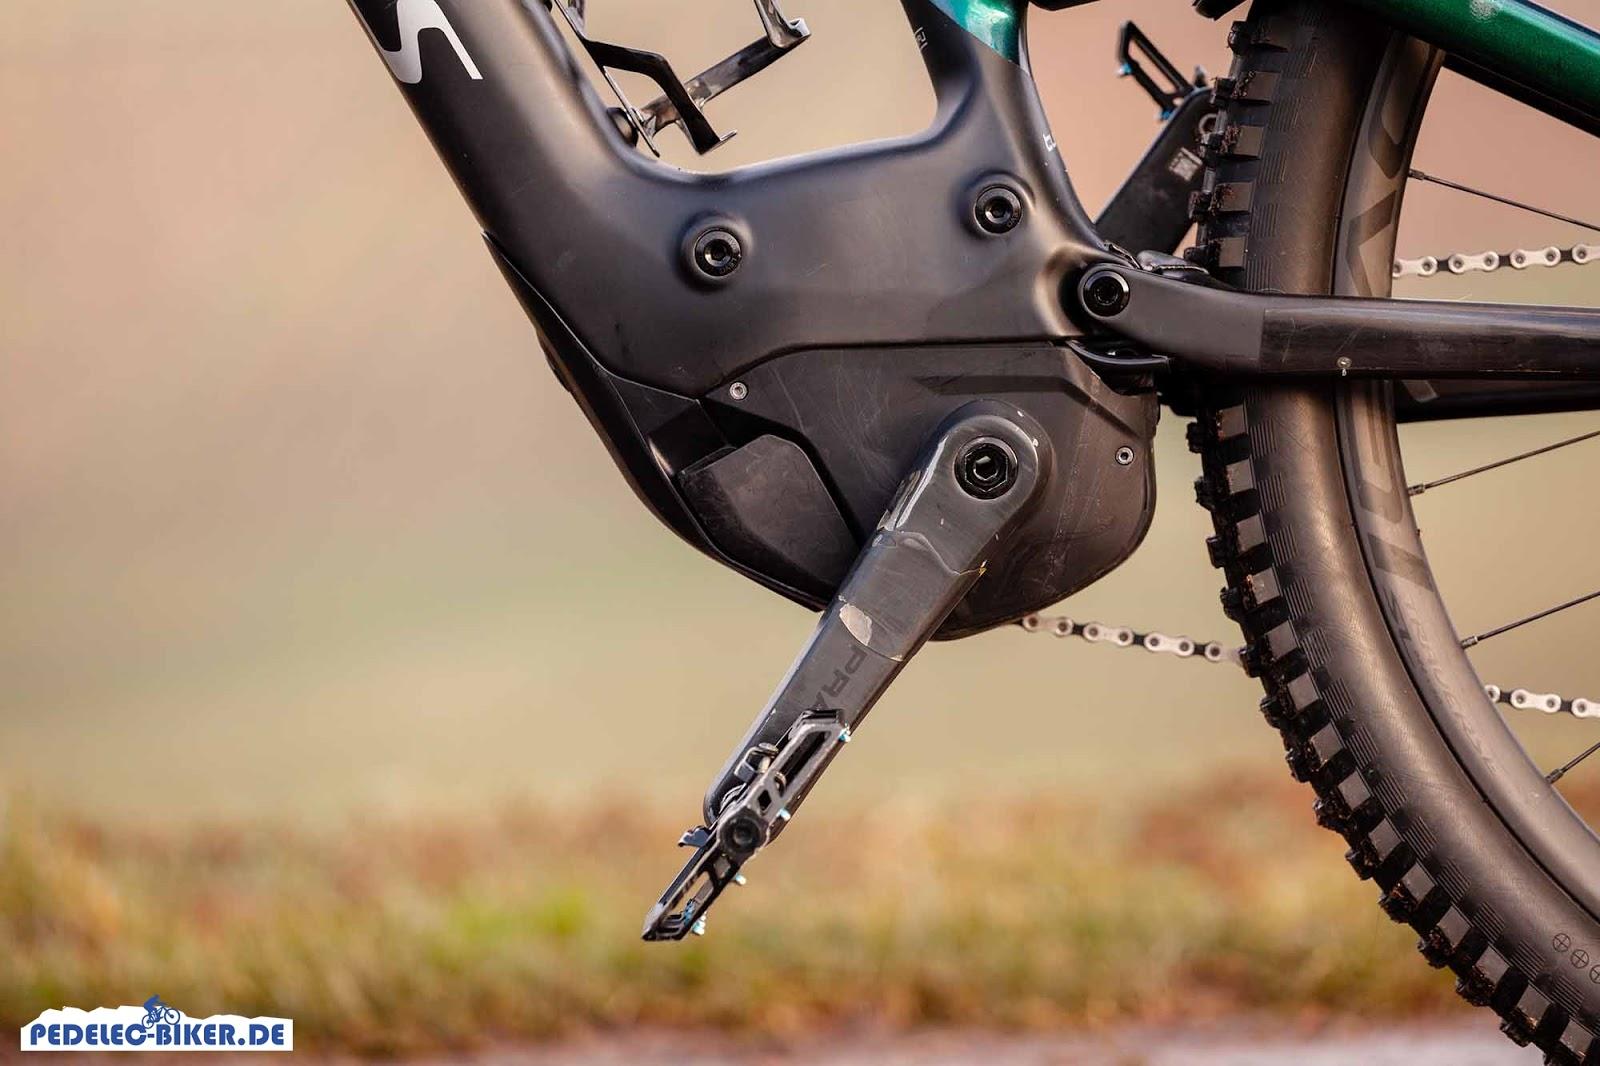 Pedelec-Biker de: Der beste eBike Antrieb 2019?